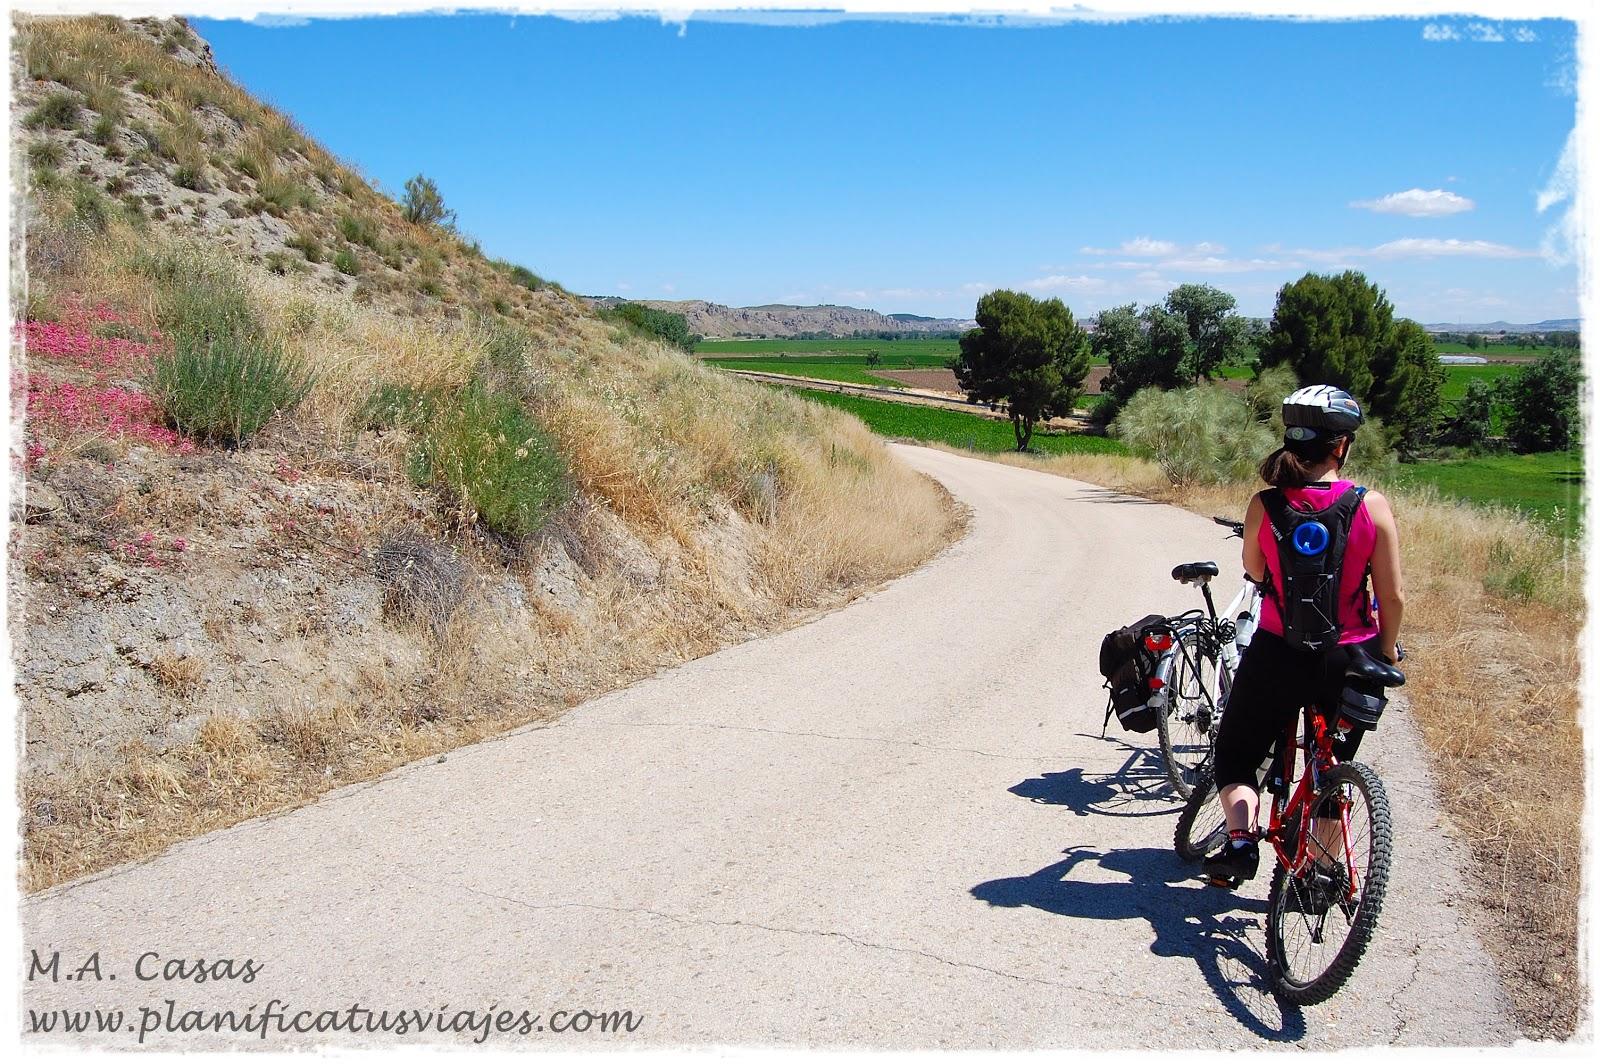 Perales del r o rivas perales del r o ruta en bici - Temperatura rivas vaciamadrid ...